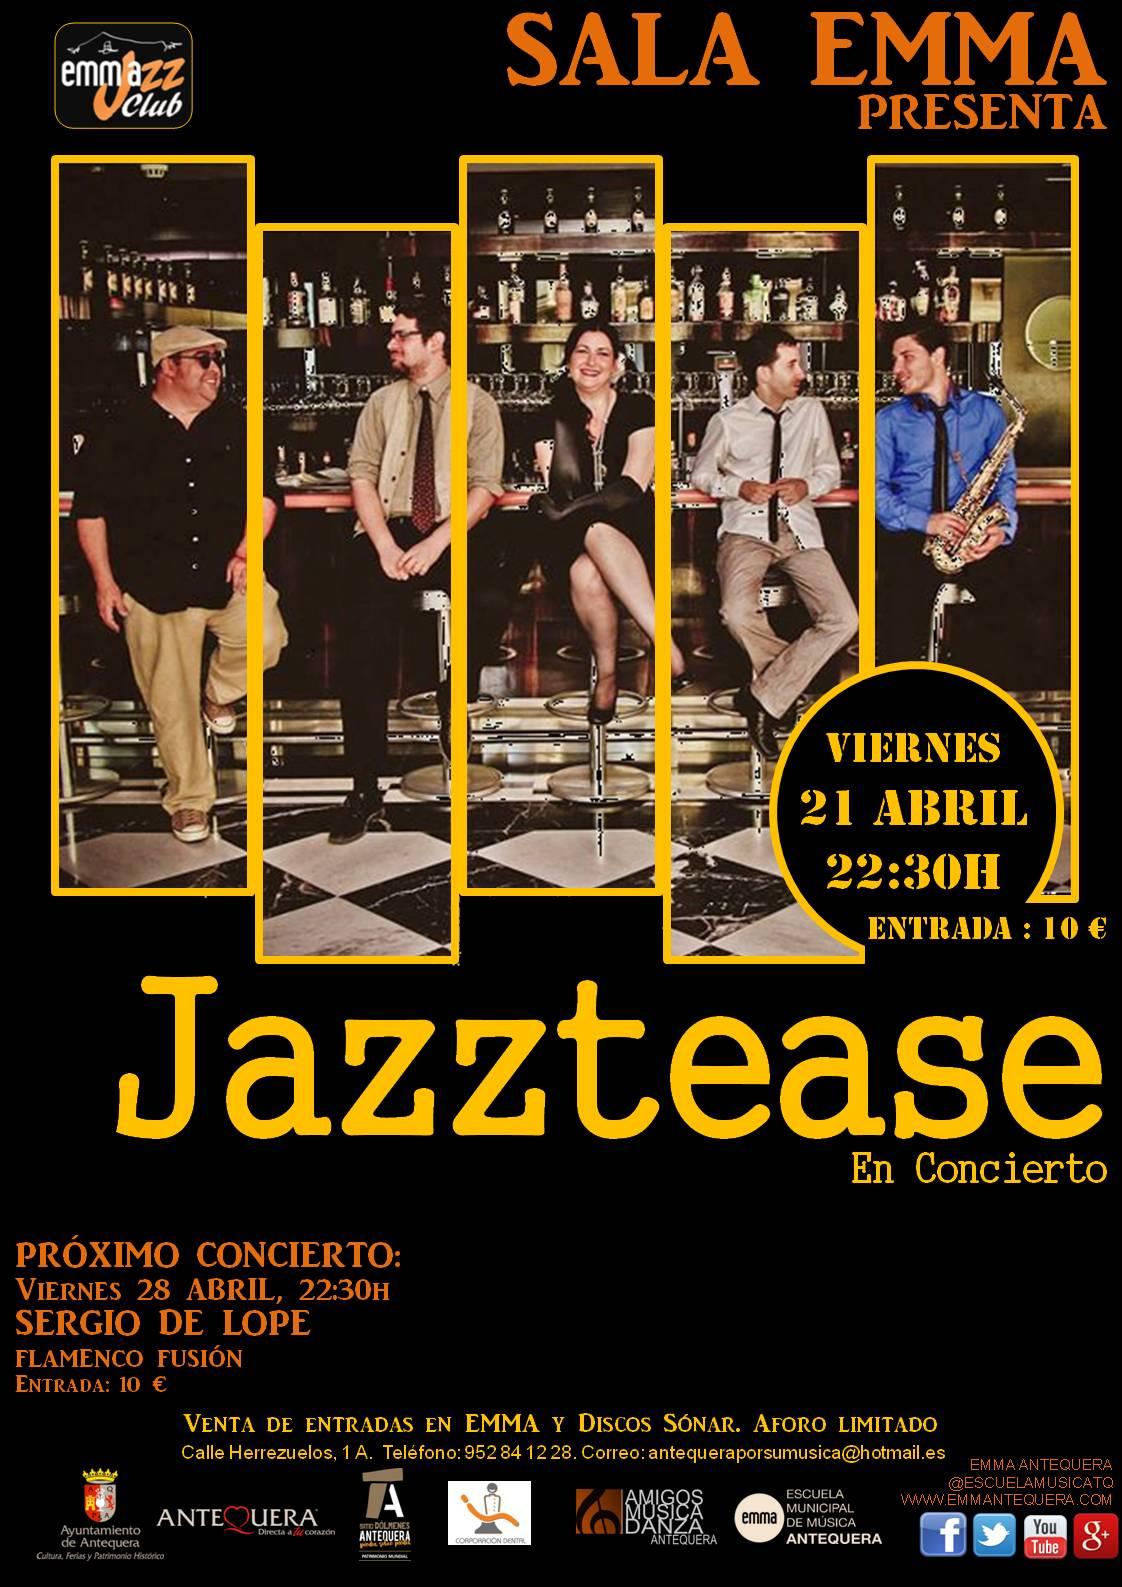 jazztease